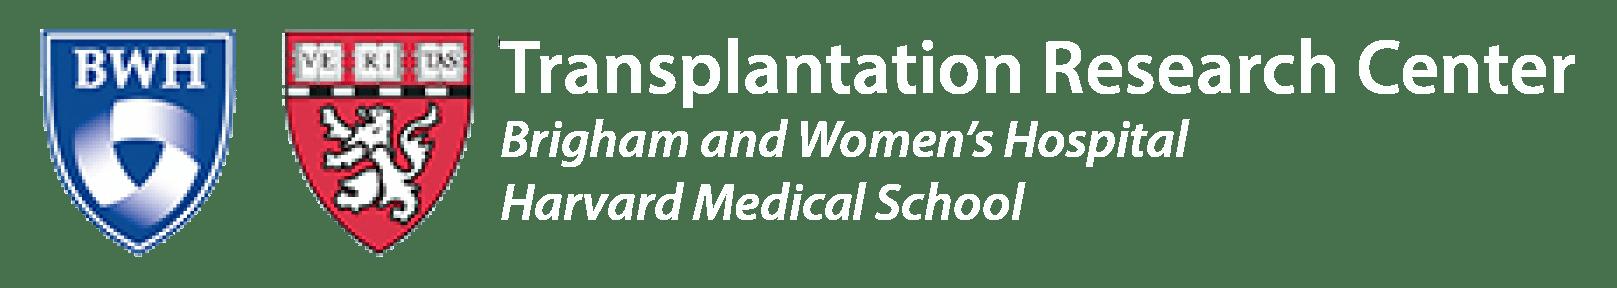 Transplantation Research Center